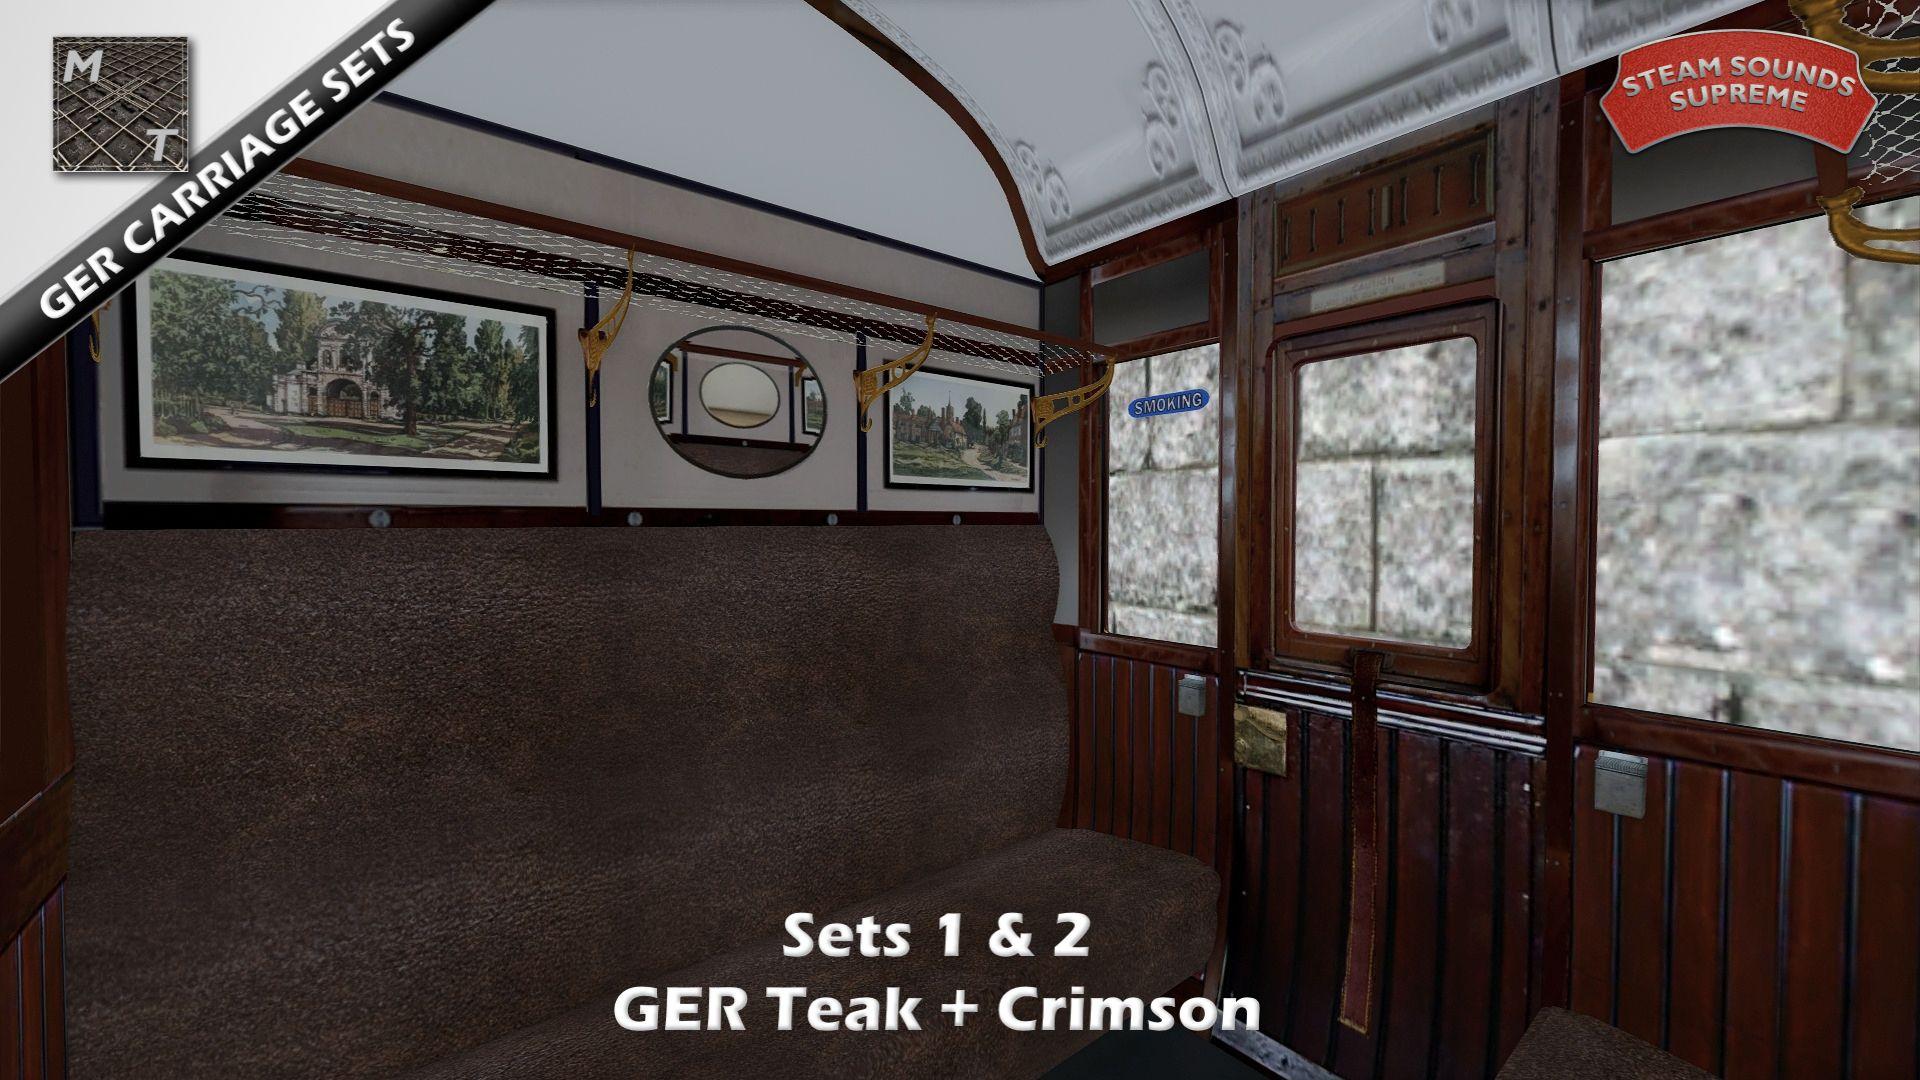 GERCorrSet1-2_26.jpg